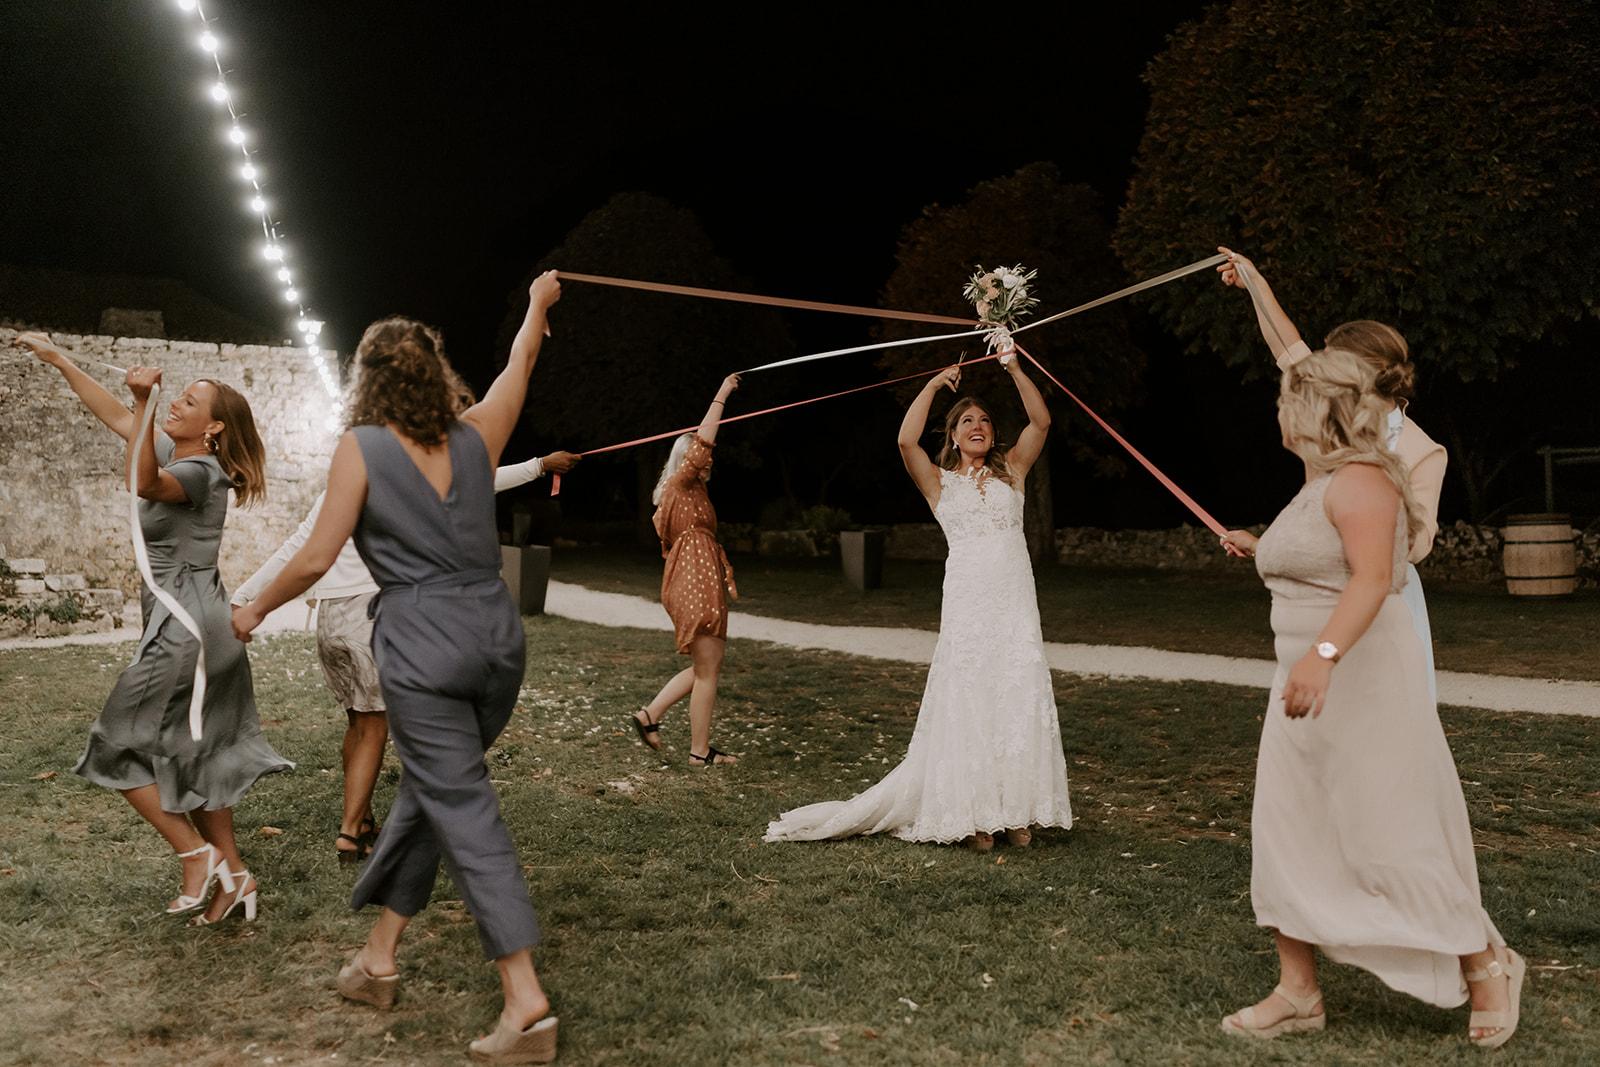 faire-appel-wedding-planner-copines-bouquet